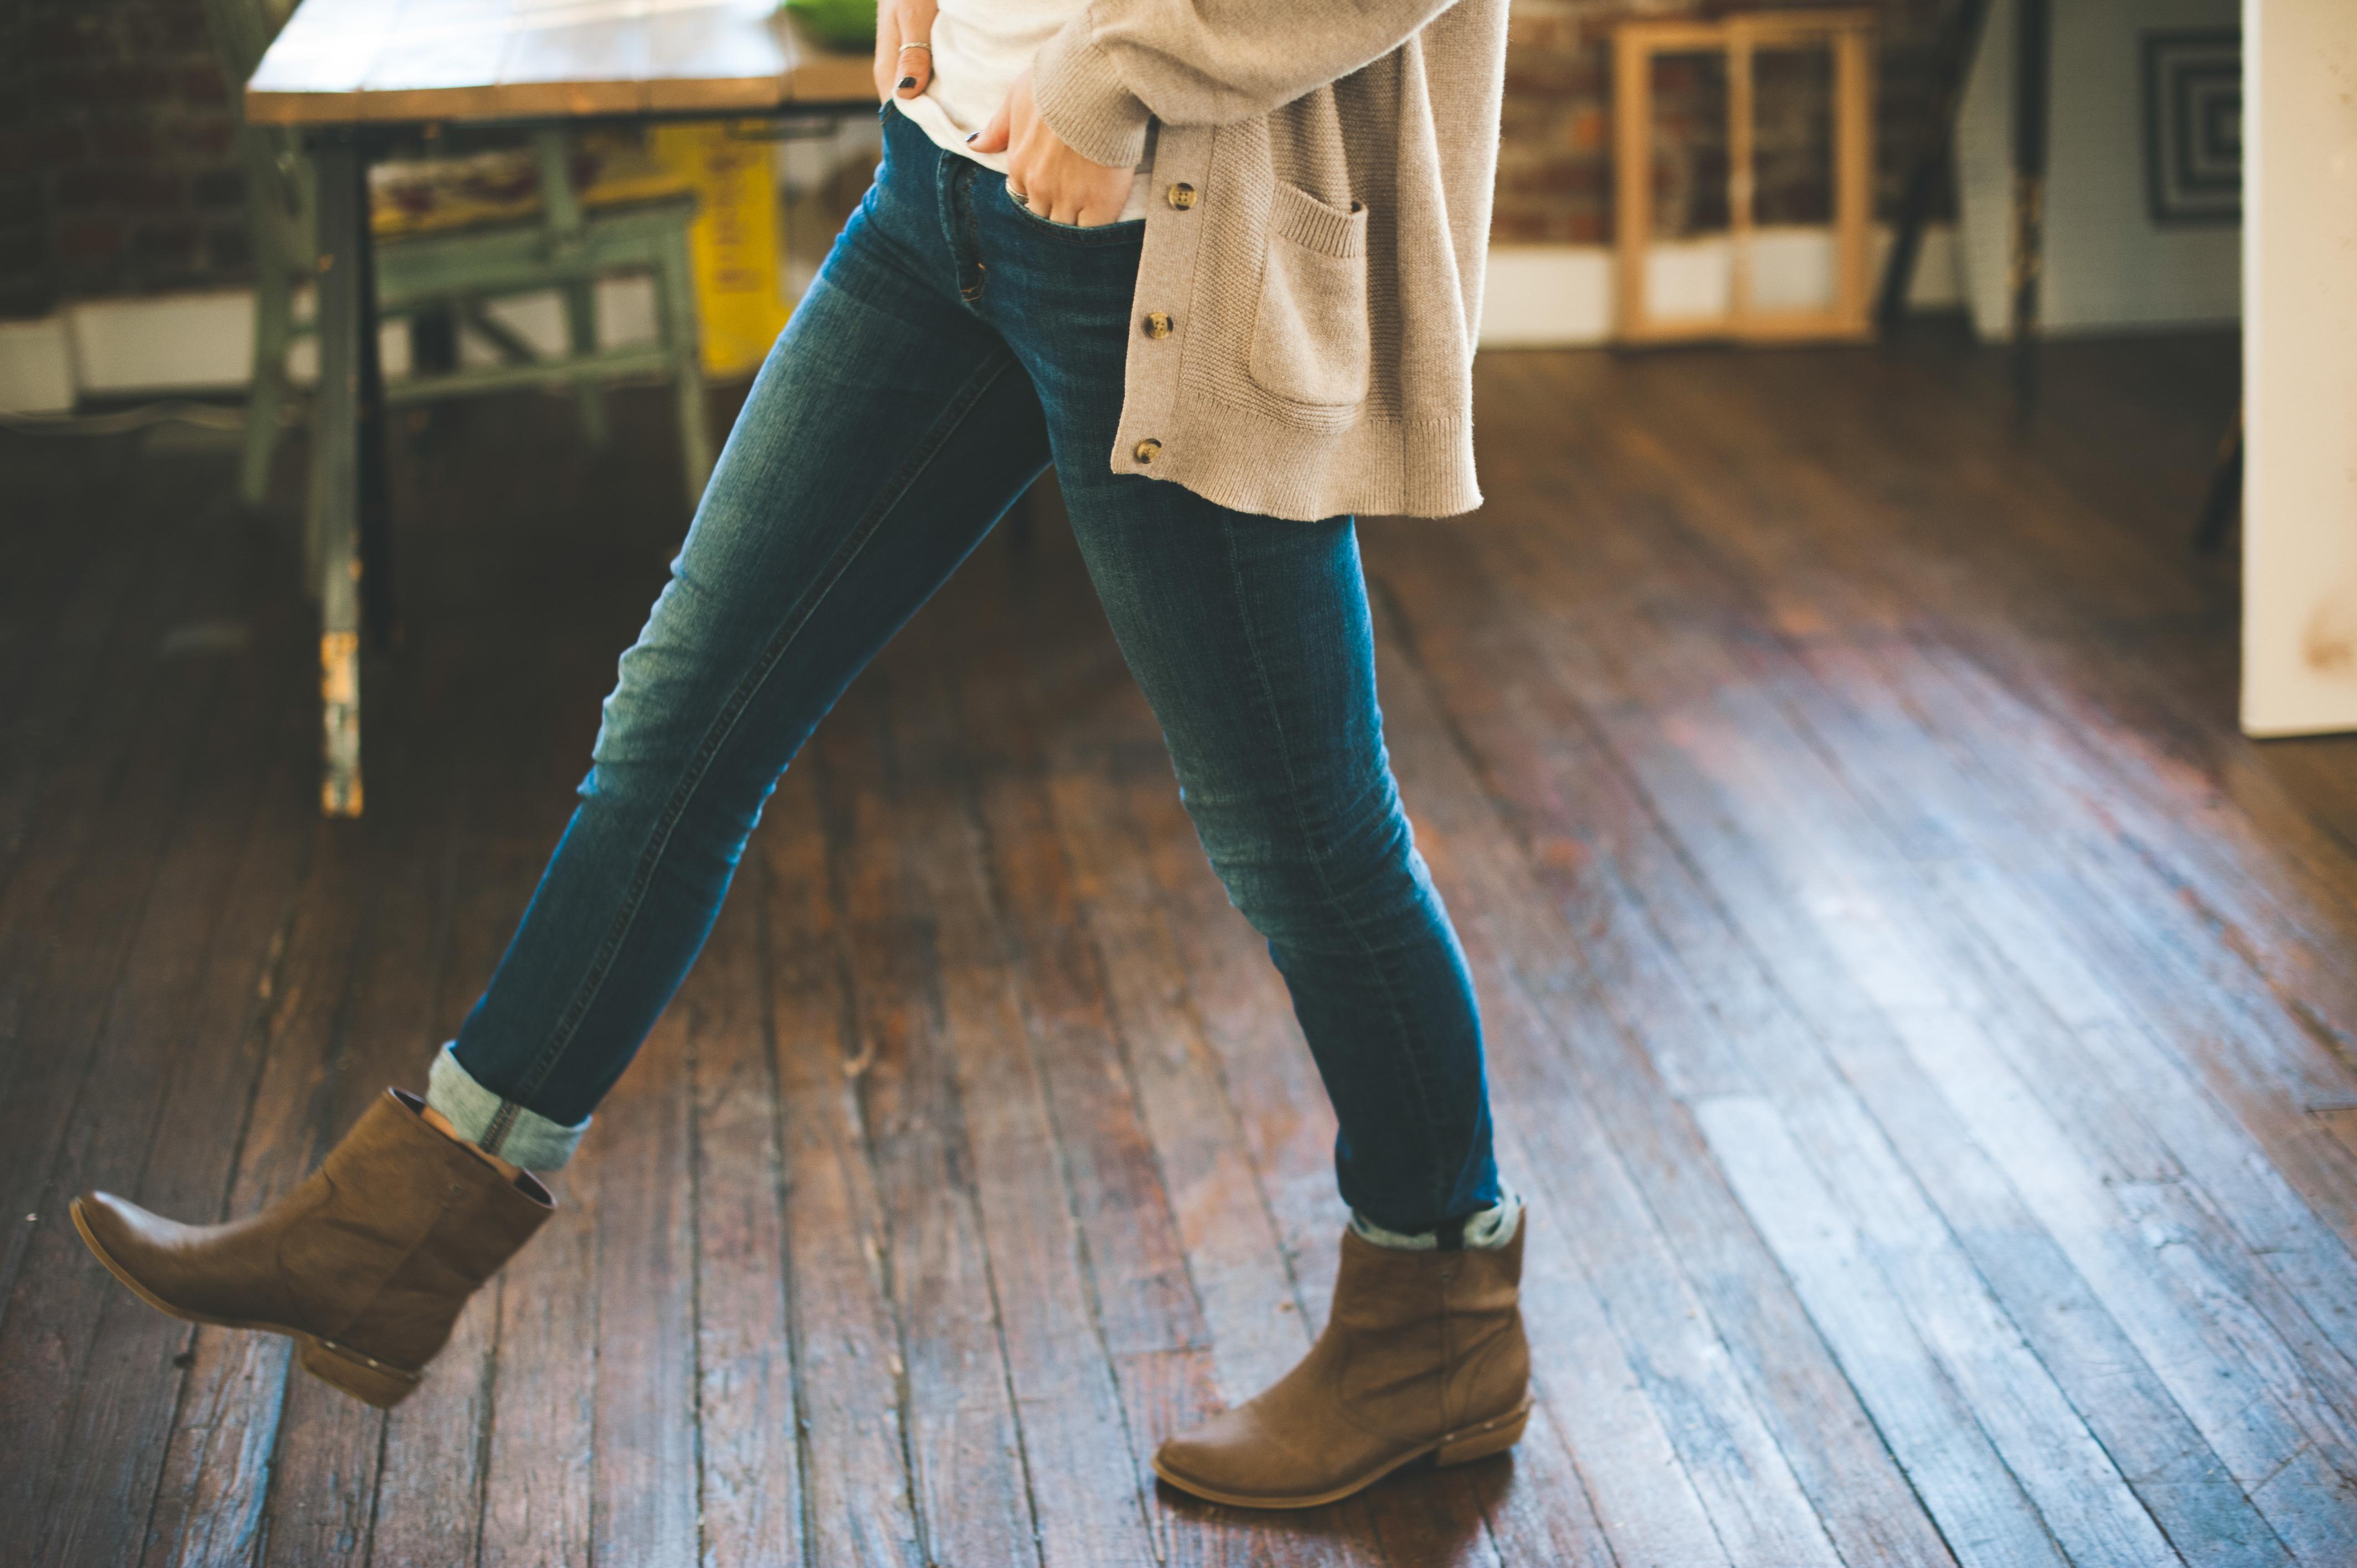 a004e006d5 walking shoe woman step leg jeans spring color fashion blue clothing denim  sweater human body boots